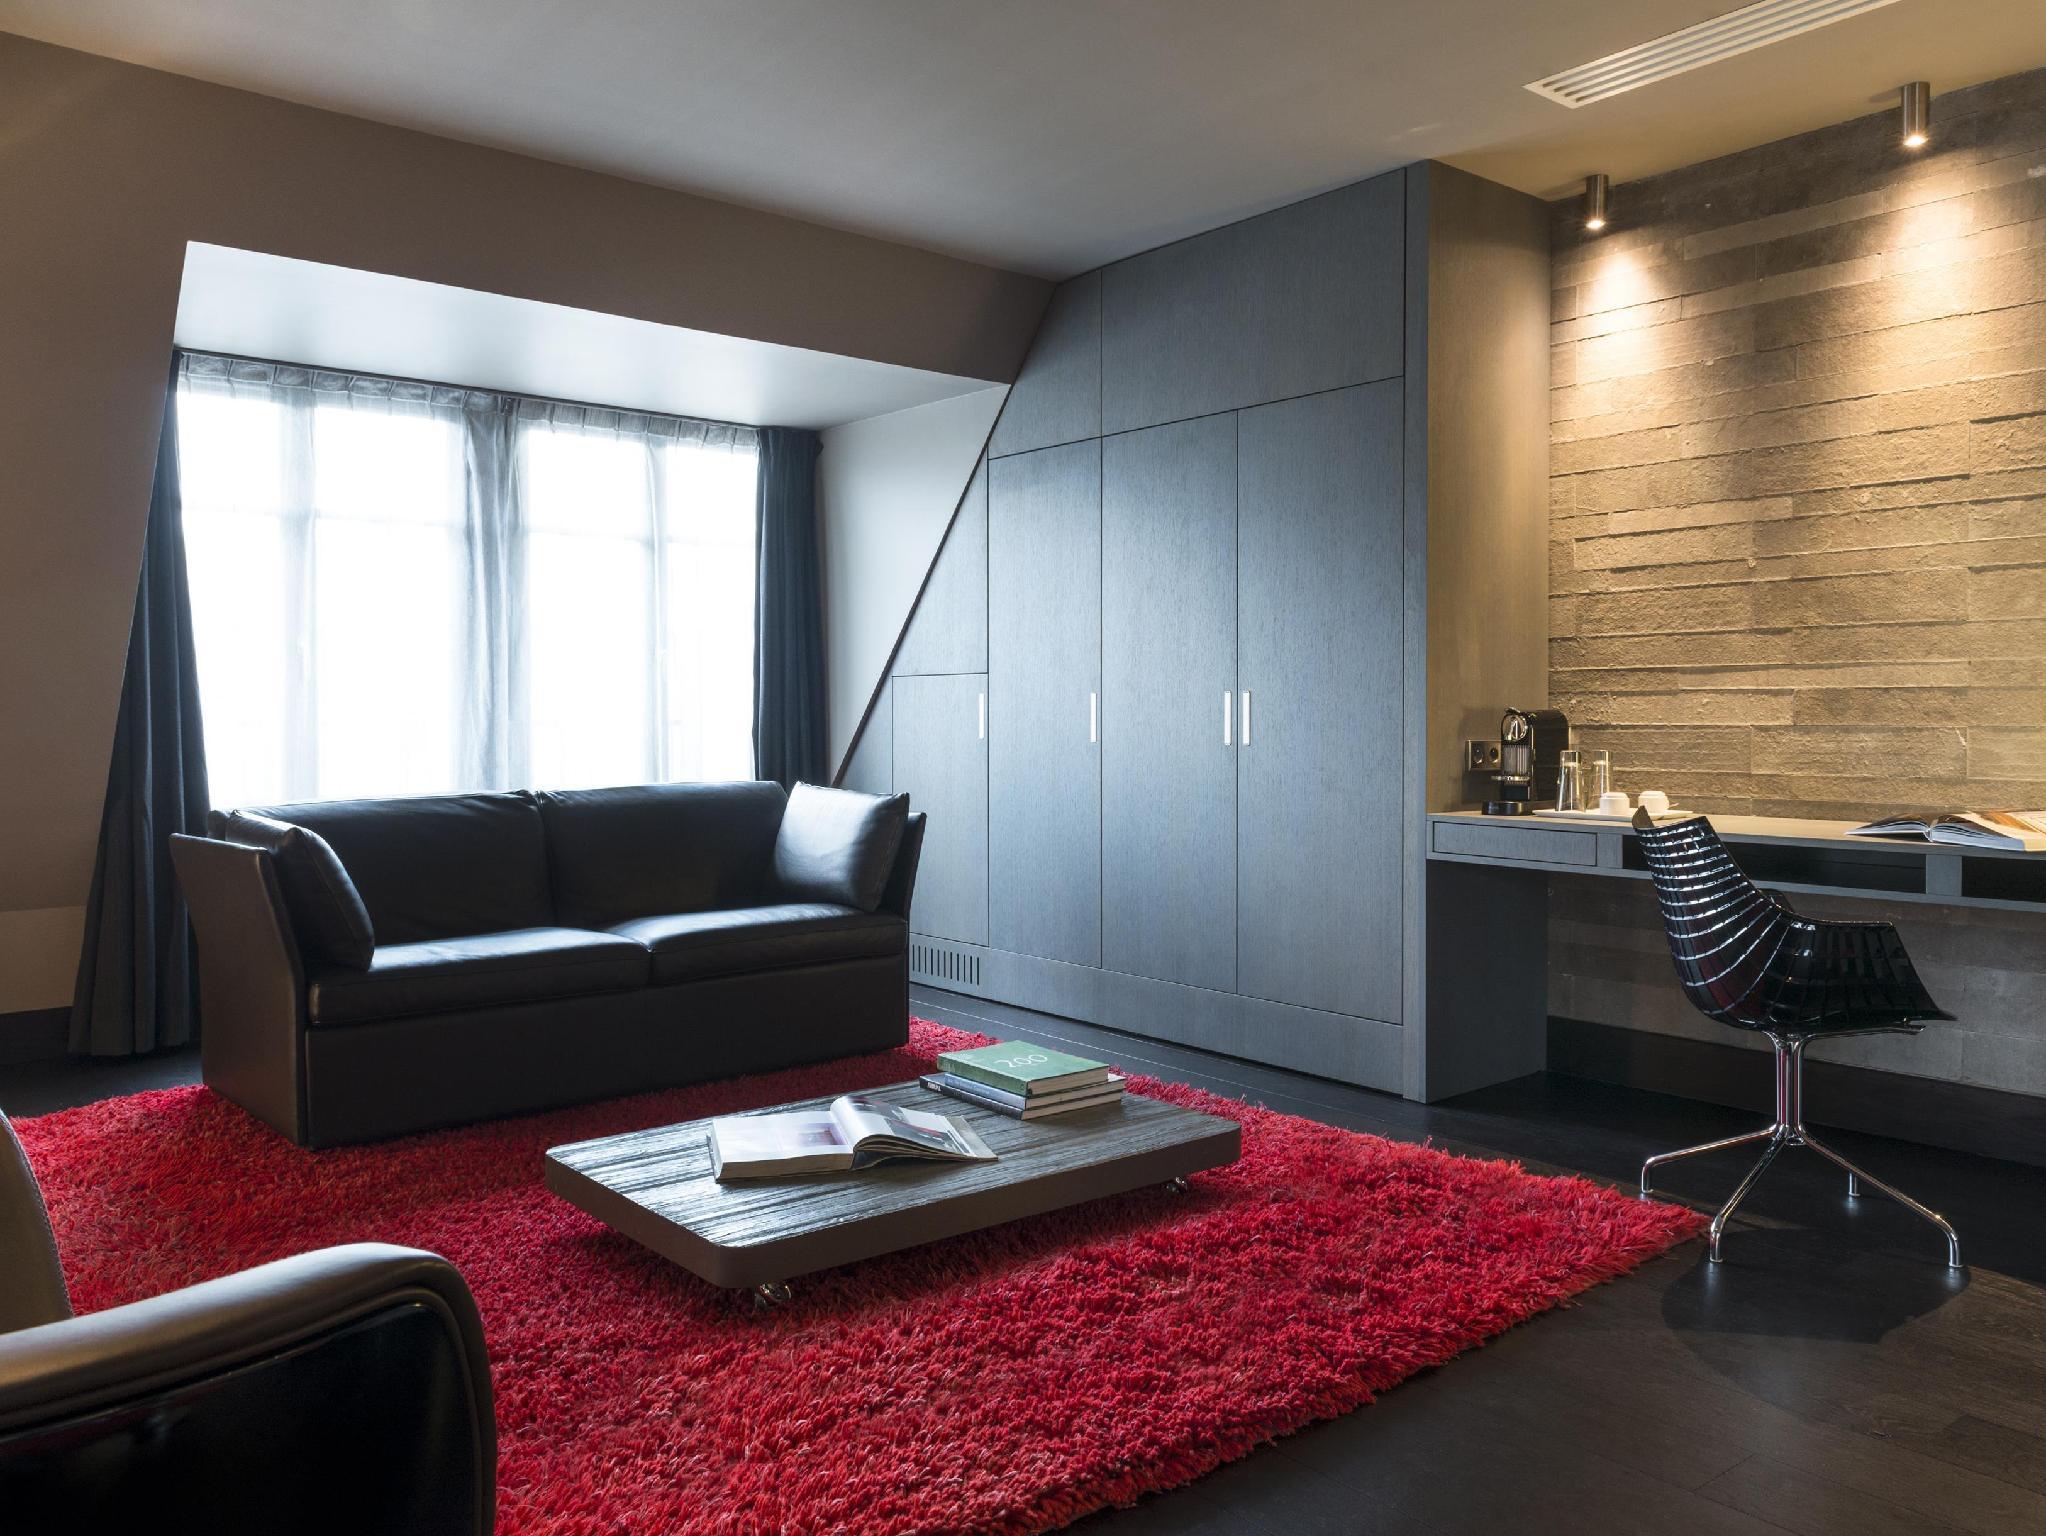 Best Price on Sezz Paris Luxury Design Hotel in Paris Reviews